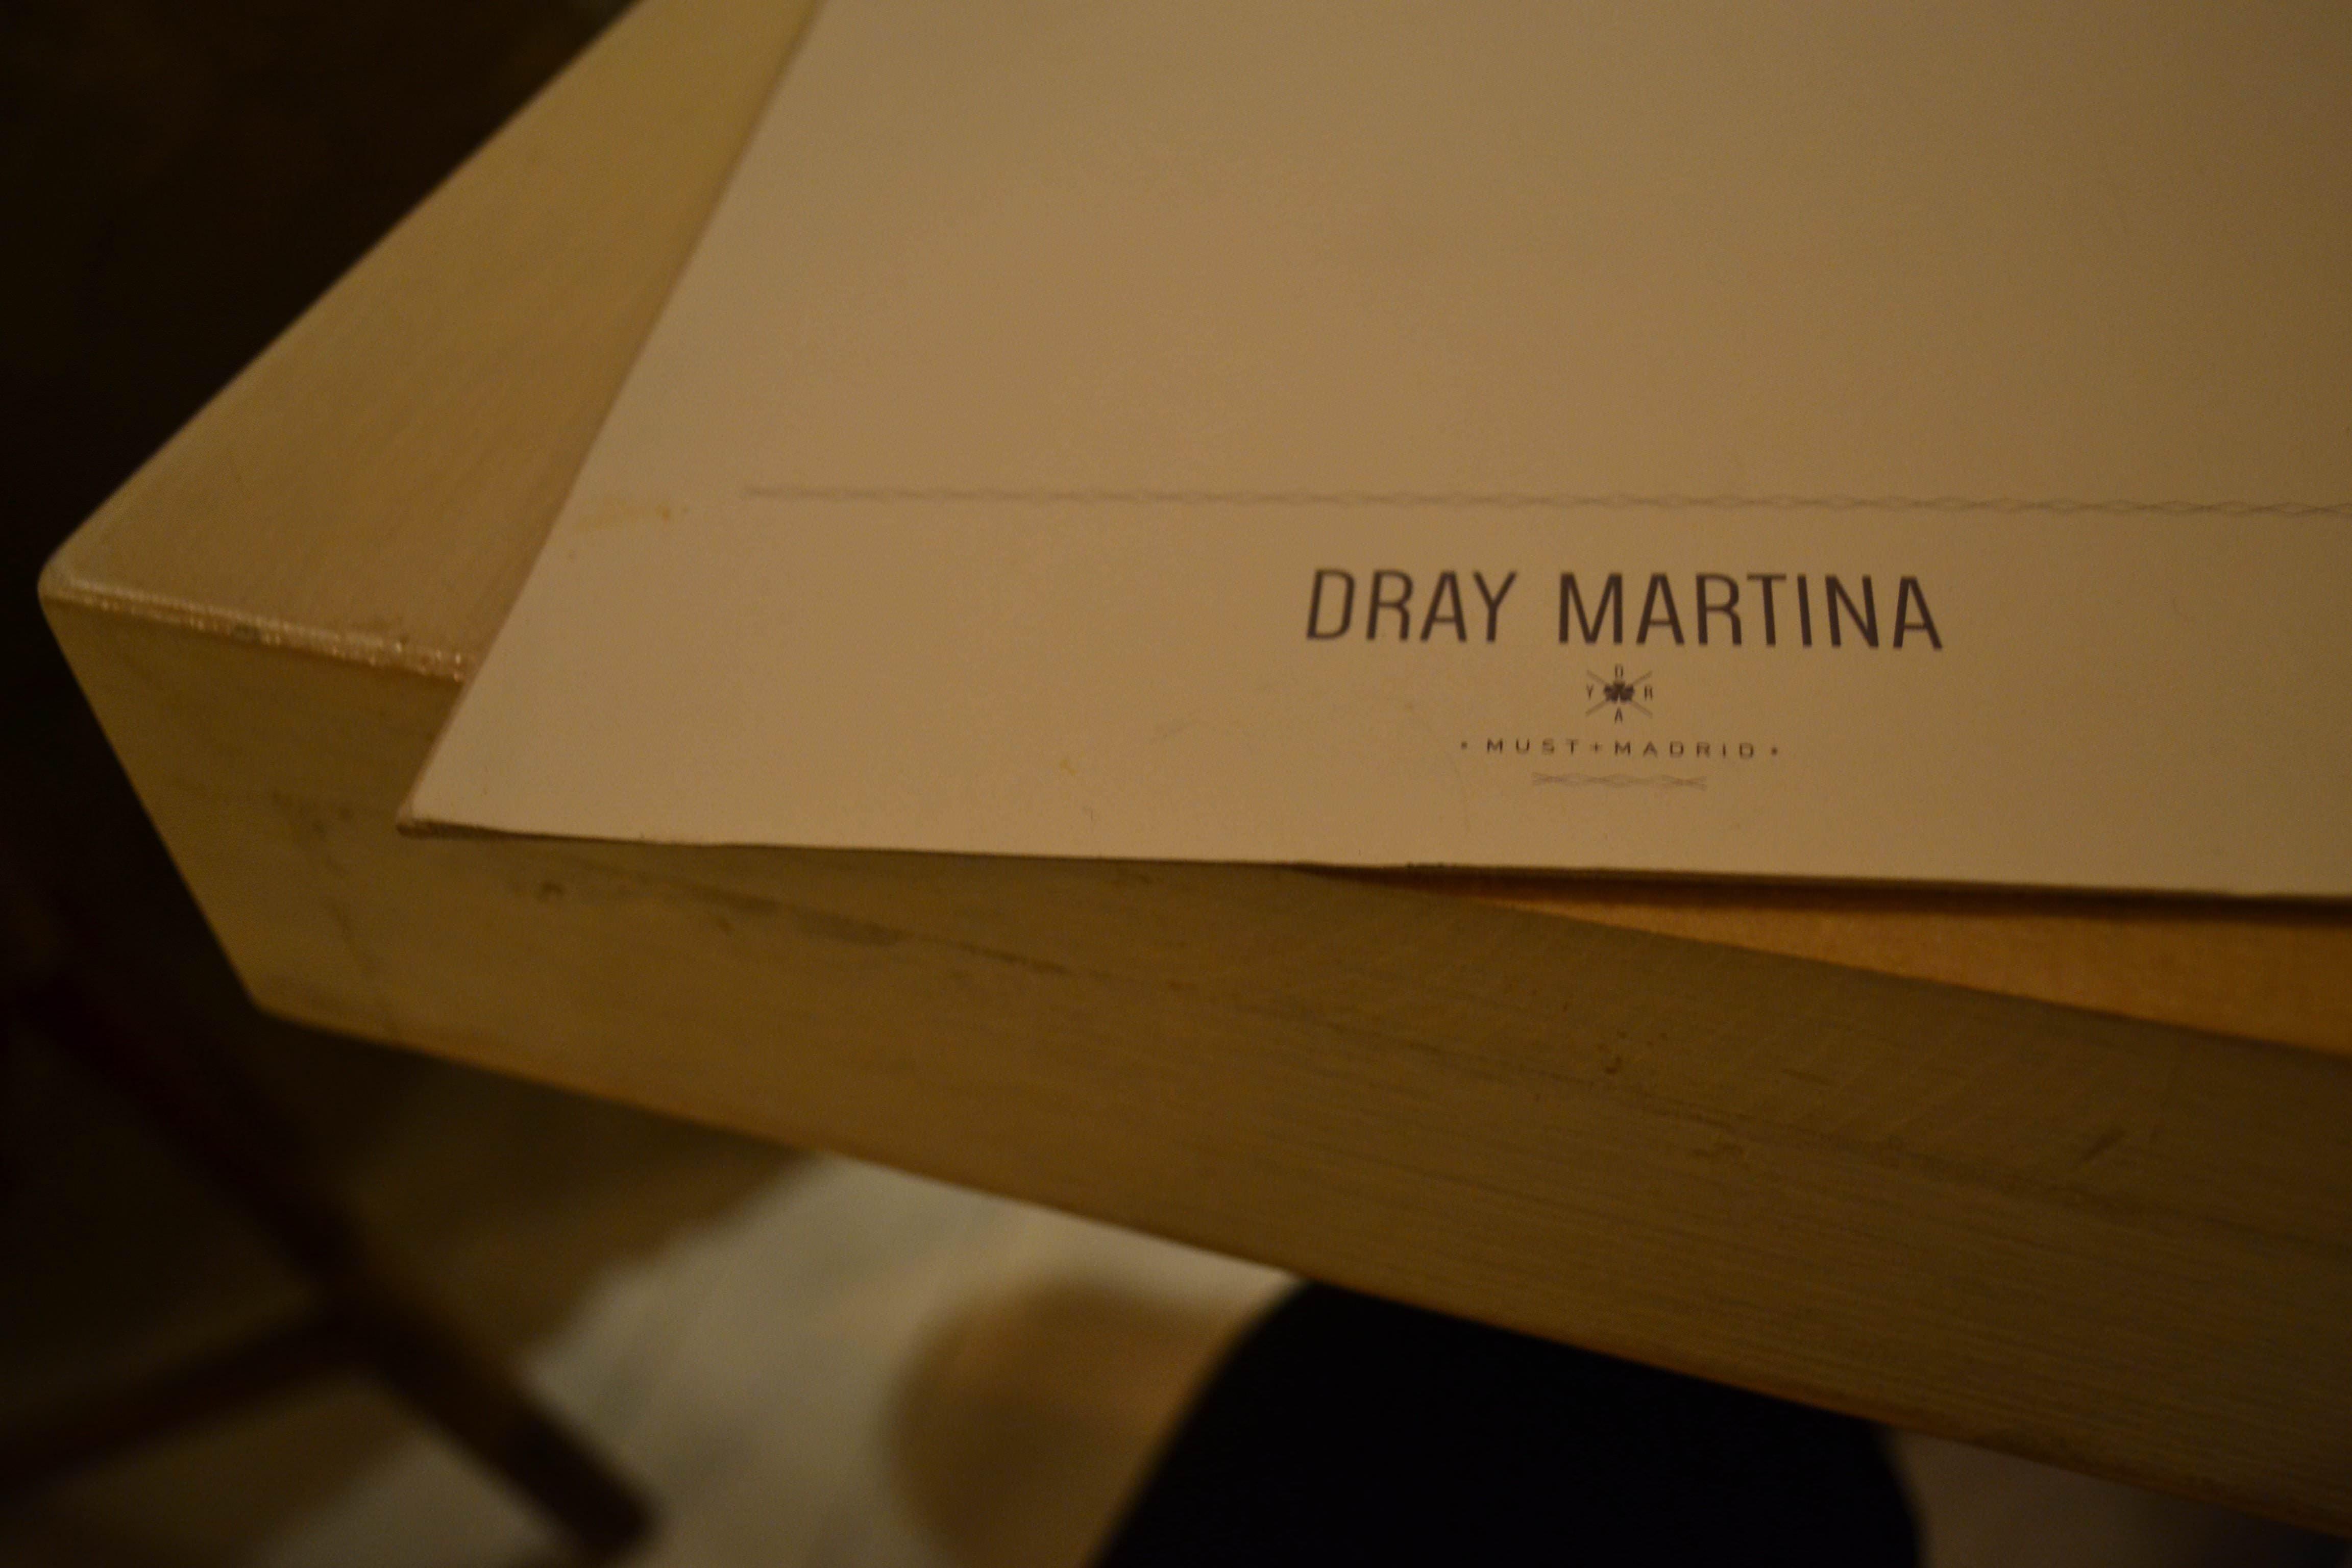 Detalle de la carta de Dray Martina